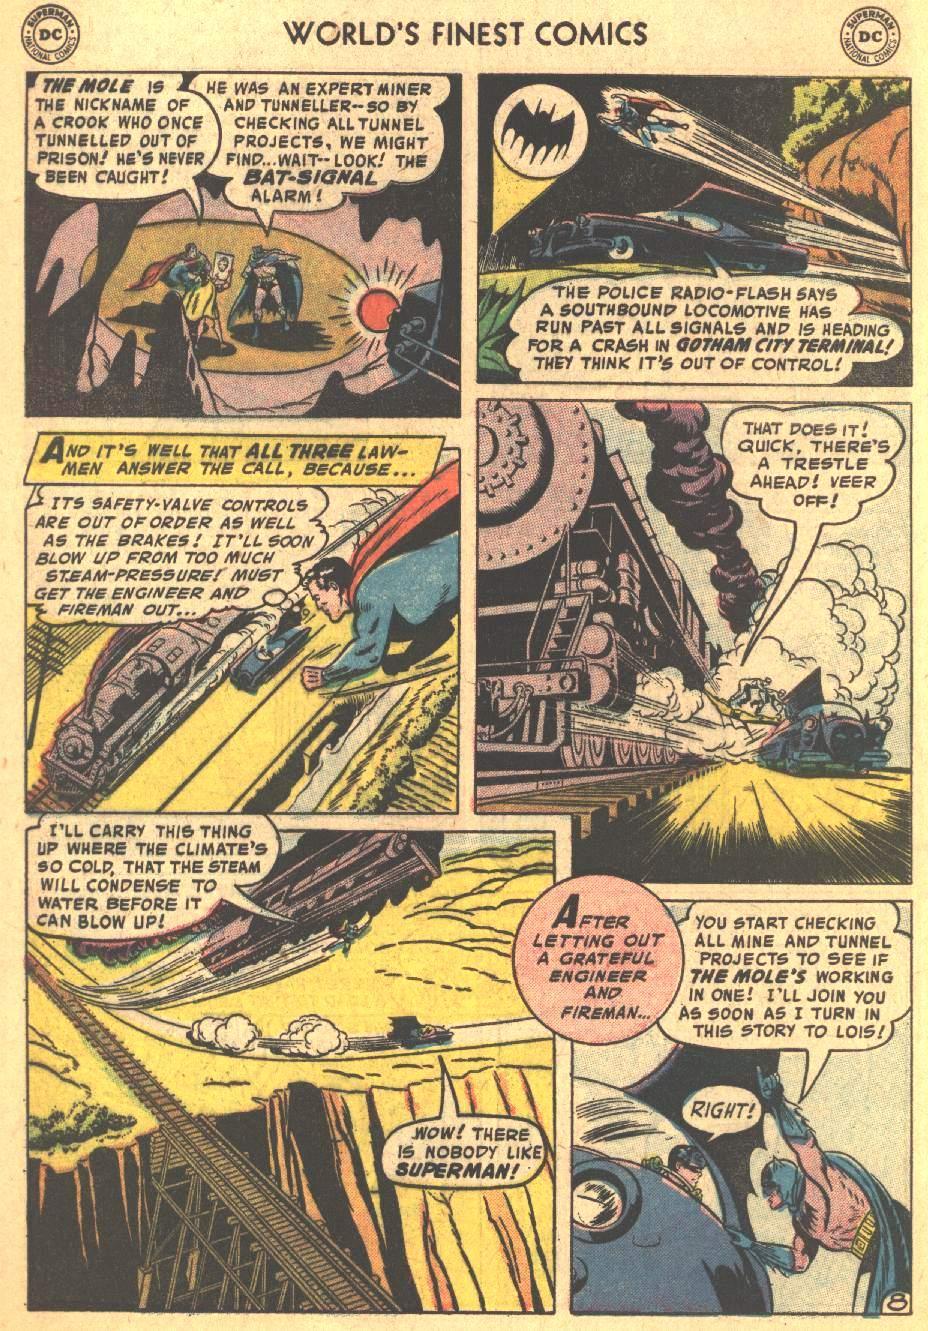 Read online World's Finest Comics comic -  Issue #80 - 10